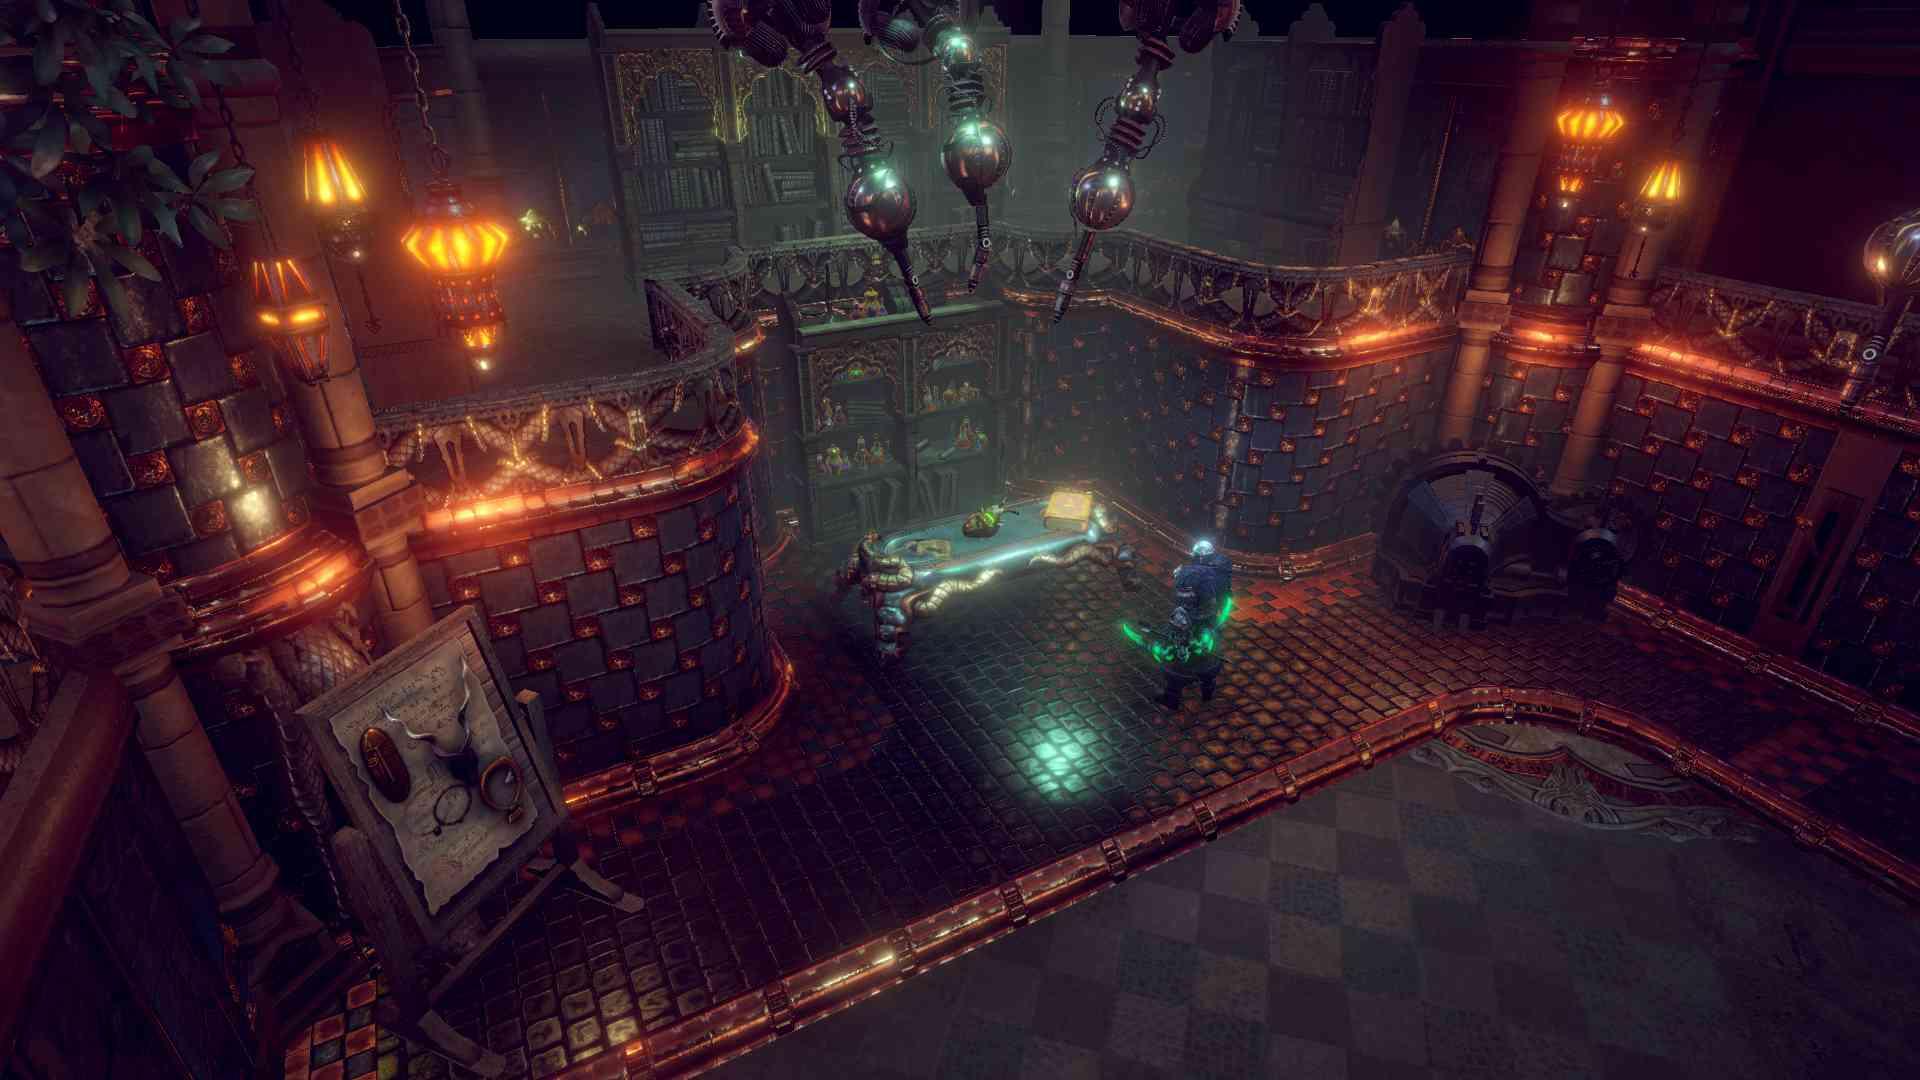 Shadows Awakening The Chromaton Chronicles On Steam Click Image For Larger Versionnameimg1634jpgviews268size638 Kbid